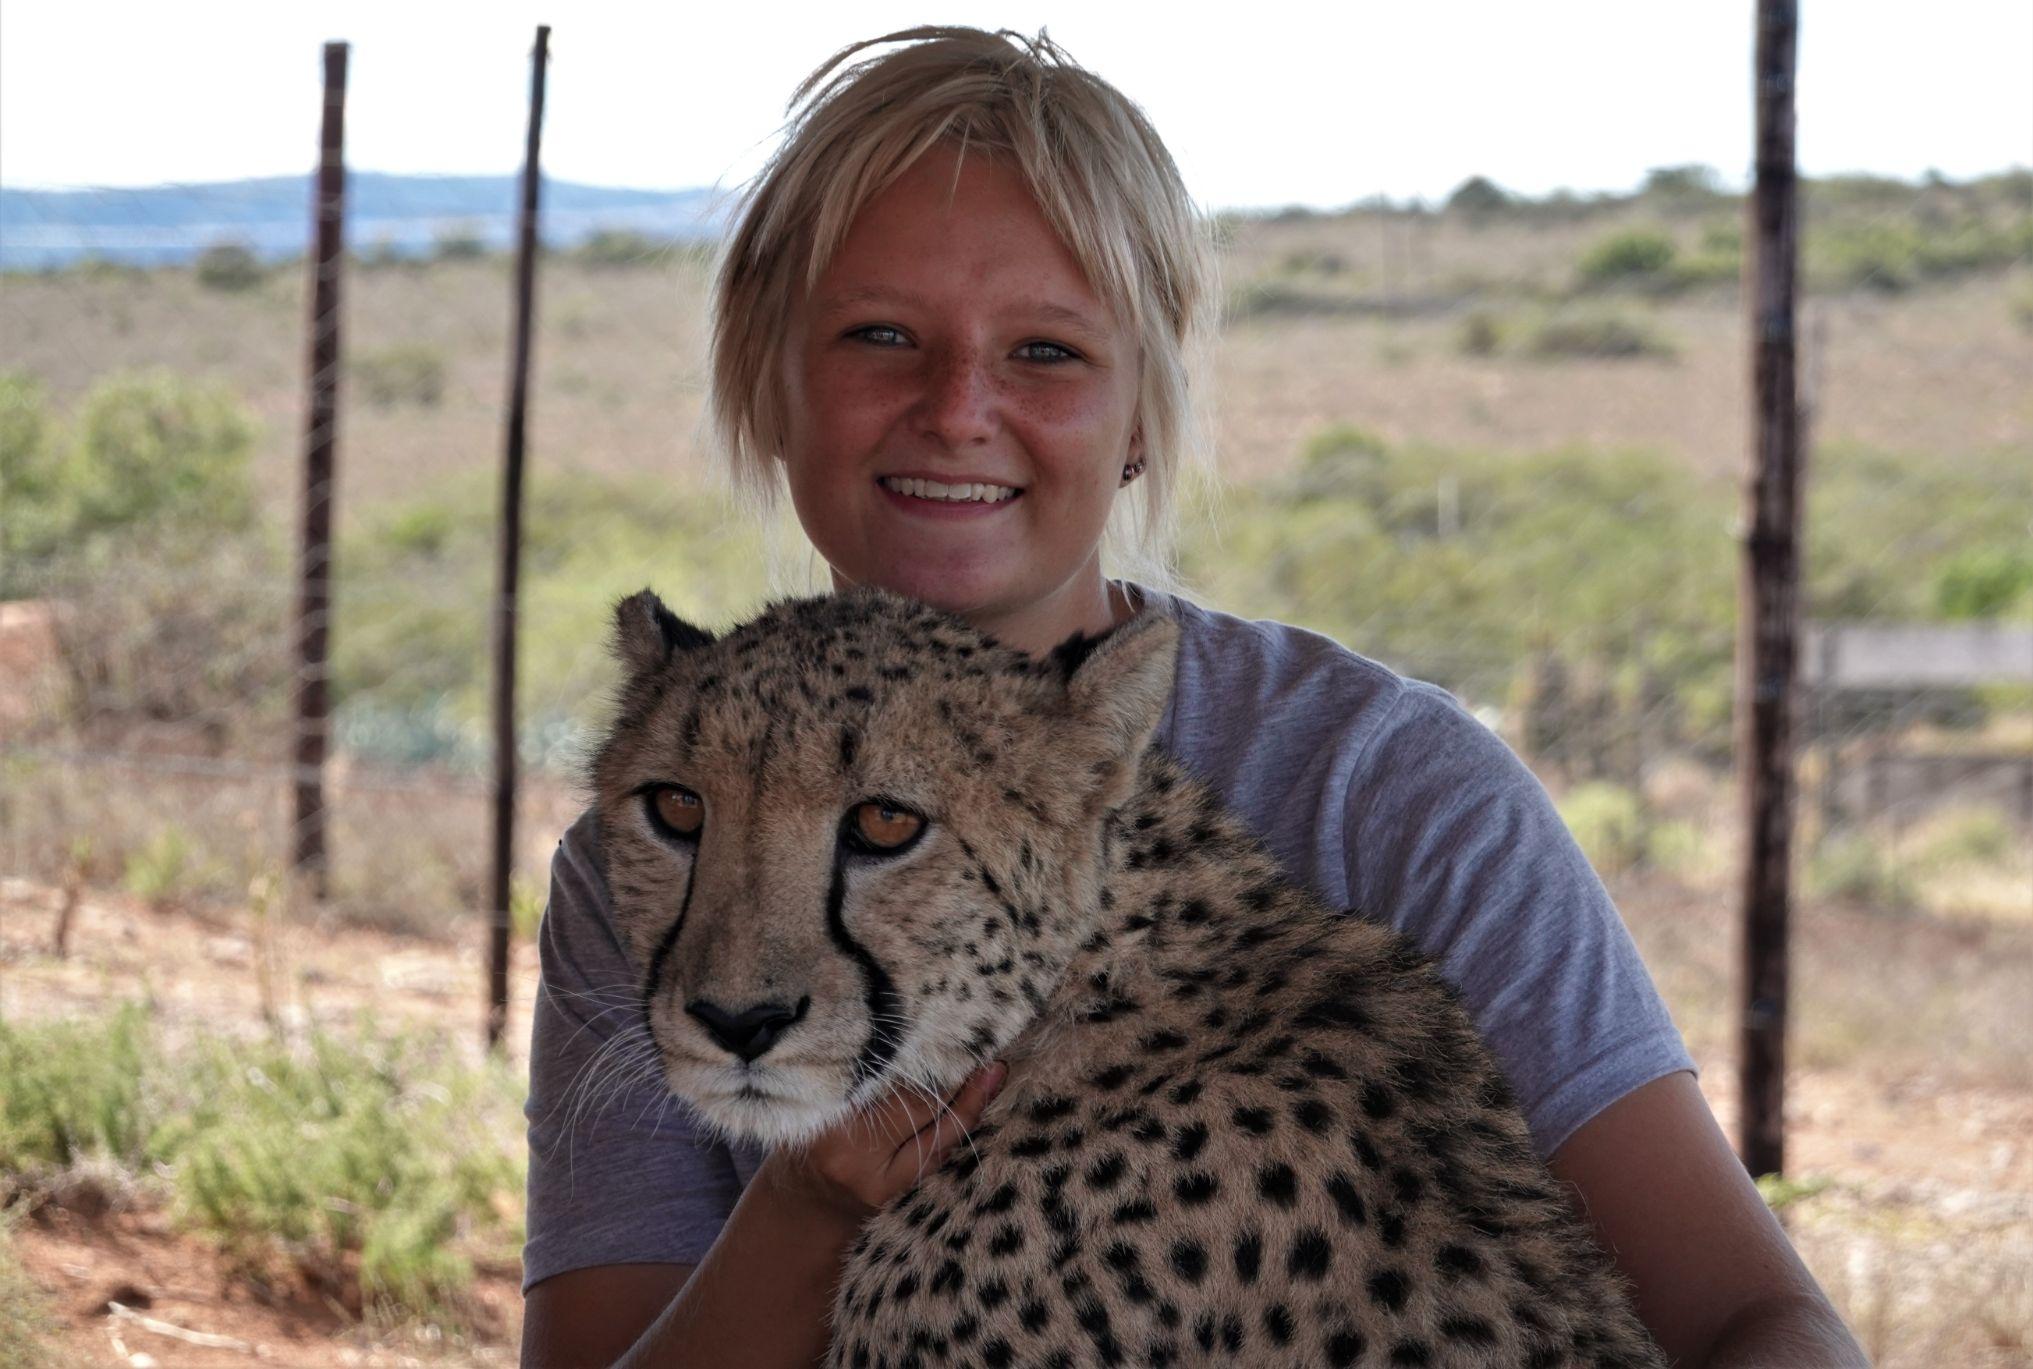 Odpolední siesta s gepardem